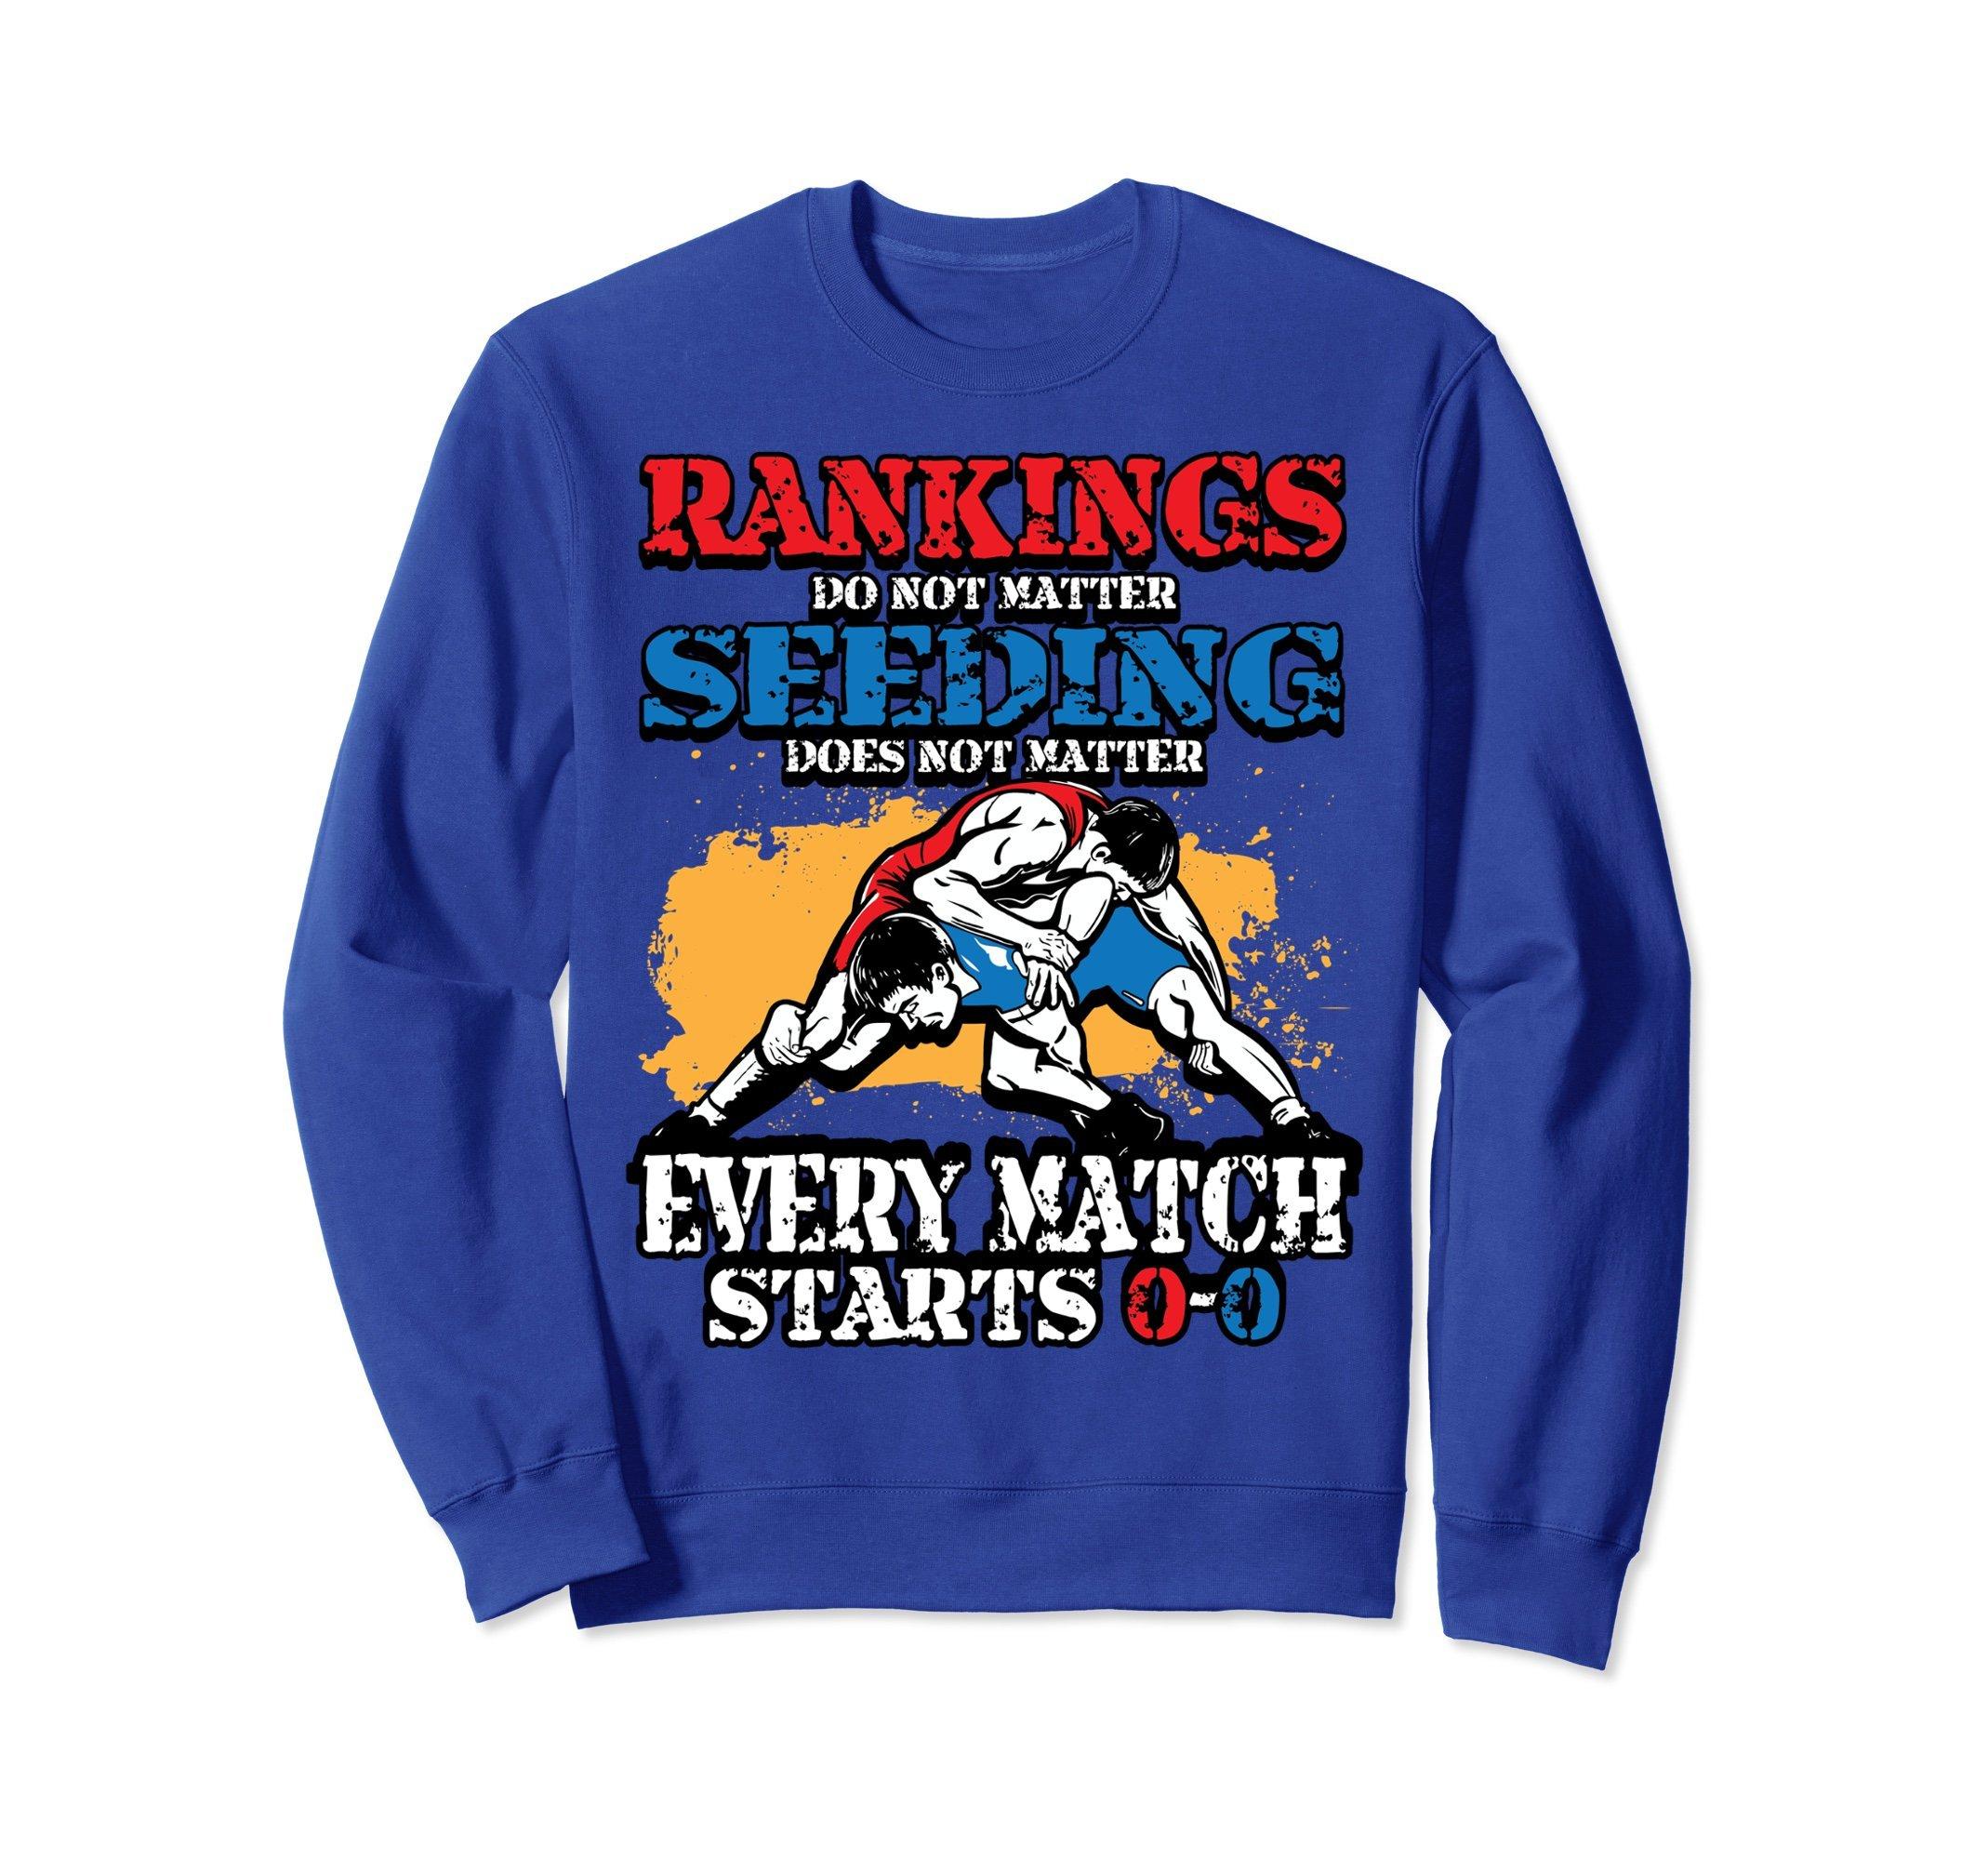 Unisex Wrestling Sweatshirt - Rankings Do Not Matter Sweater Small Royal Blue by Wrestling Shirt by Crush Retro